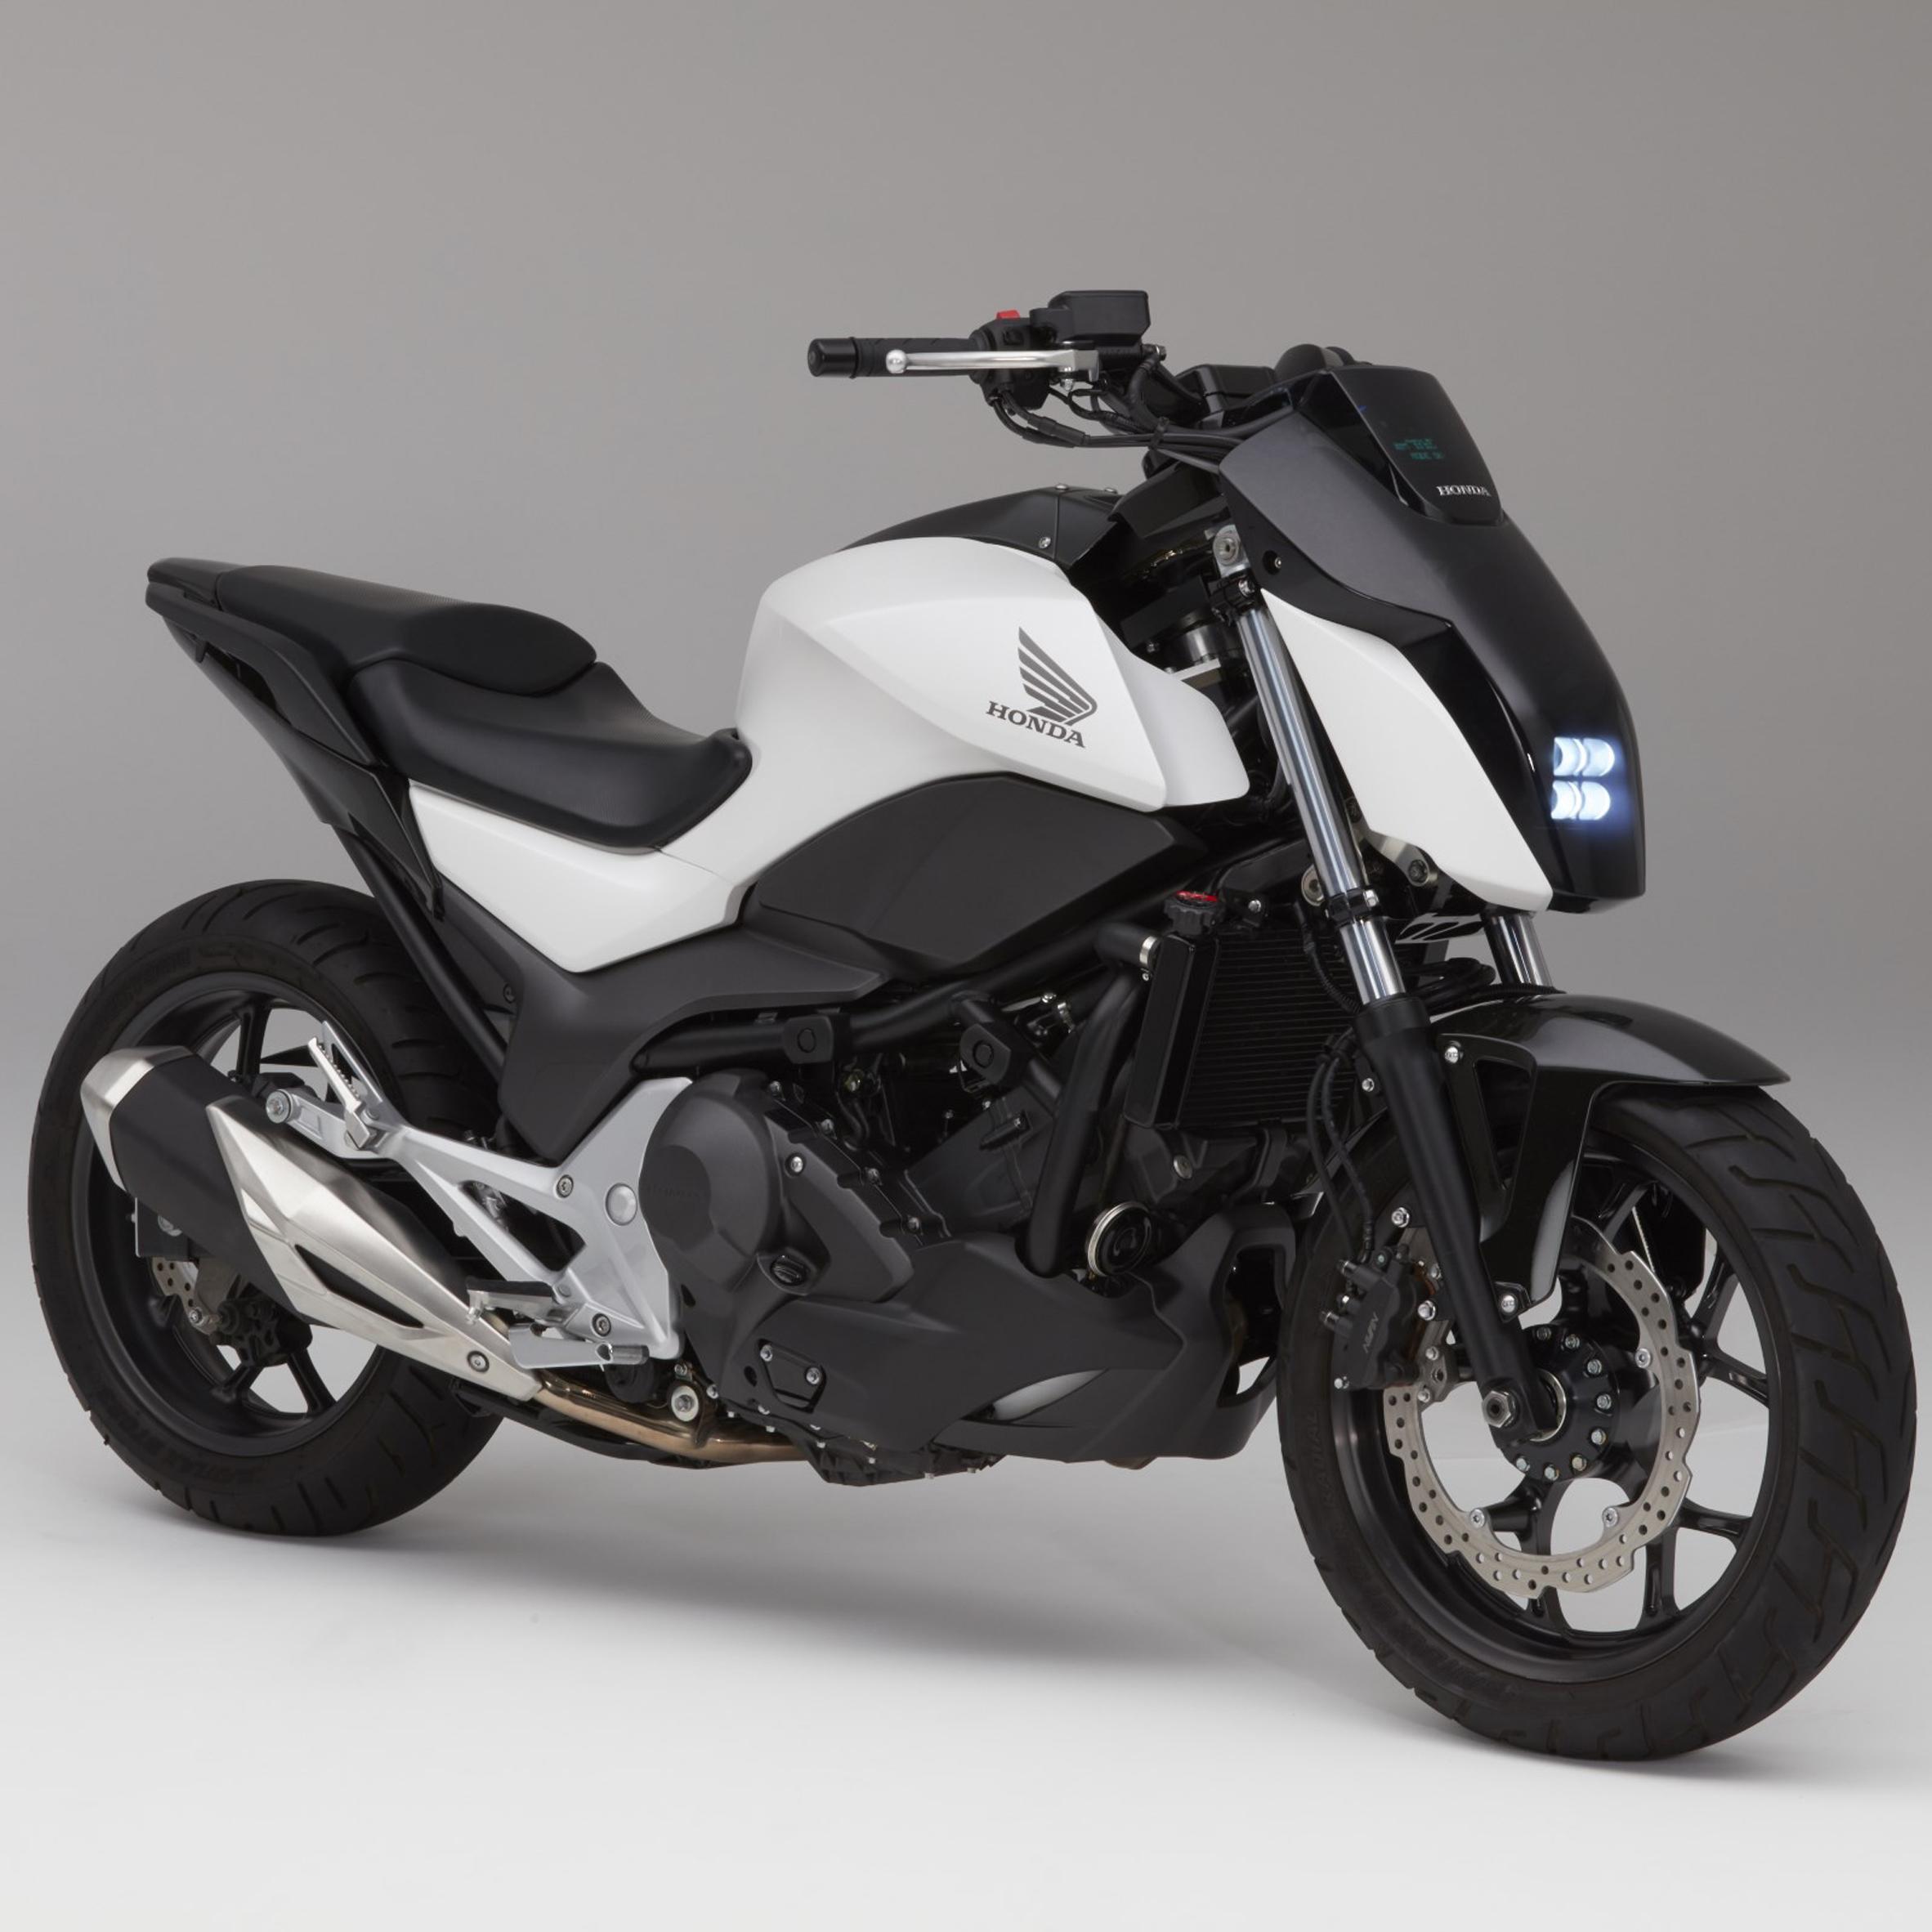 Honda unveils self-balancing motorcycle that can drive itself Dezeen